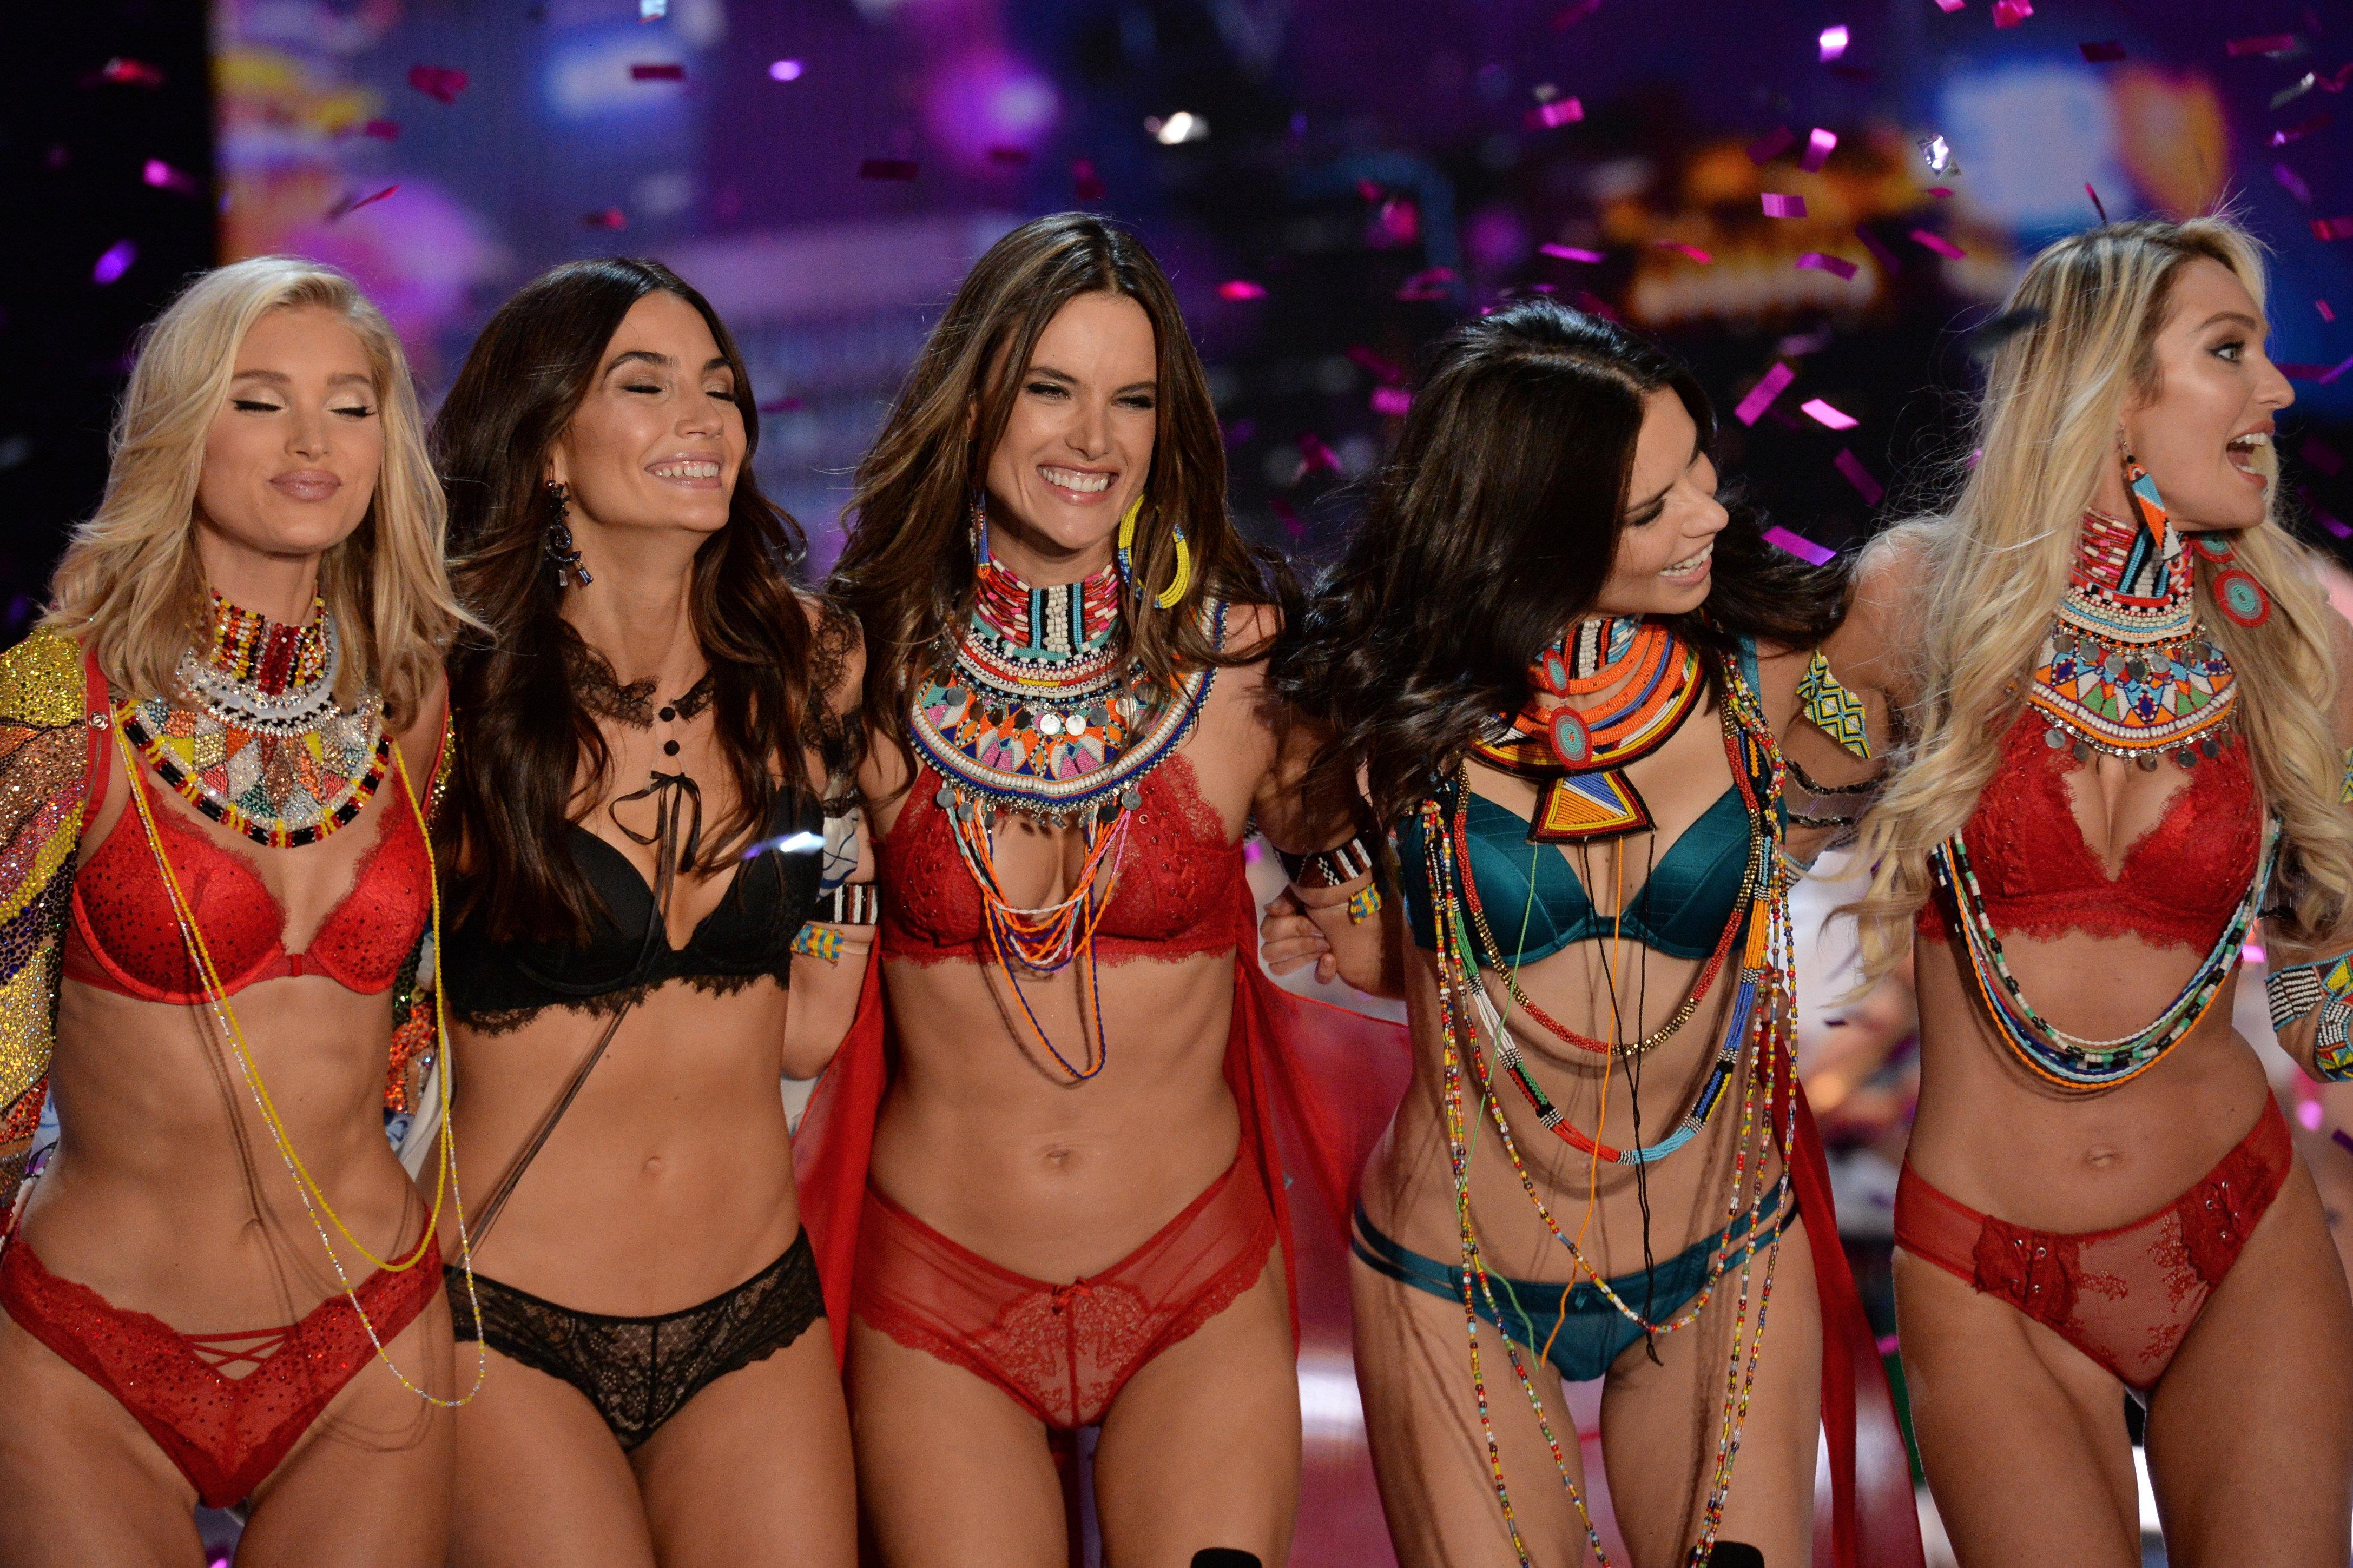 H Karlie Kloss υπερασπίζεται την επίδειξη της Victoria's Secret στην εποχή του Me Too: «Mας επιτρέπει να είμαστε η καλύτερη ε...